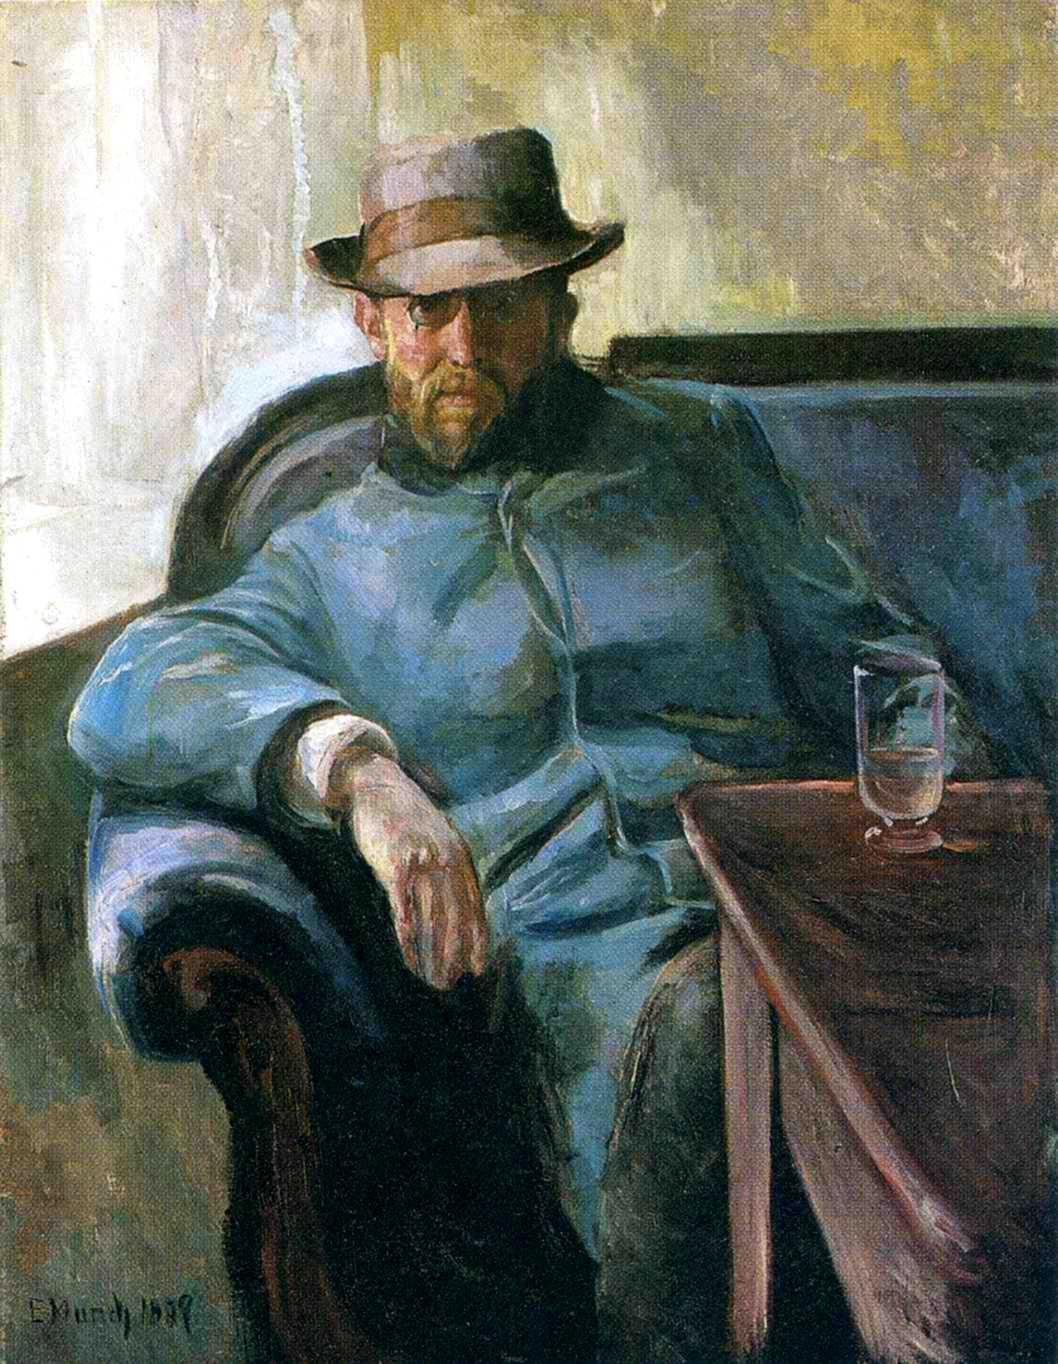 Hans Jaeger pintat per Edvard Munch (1889)